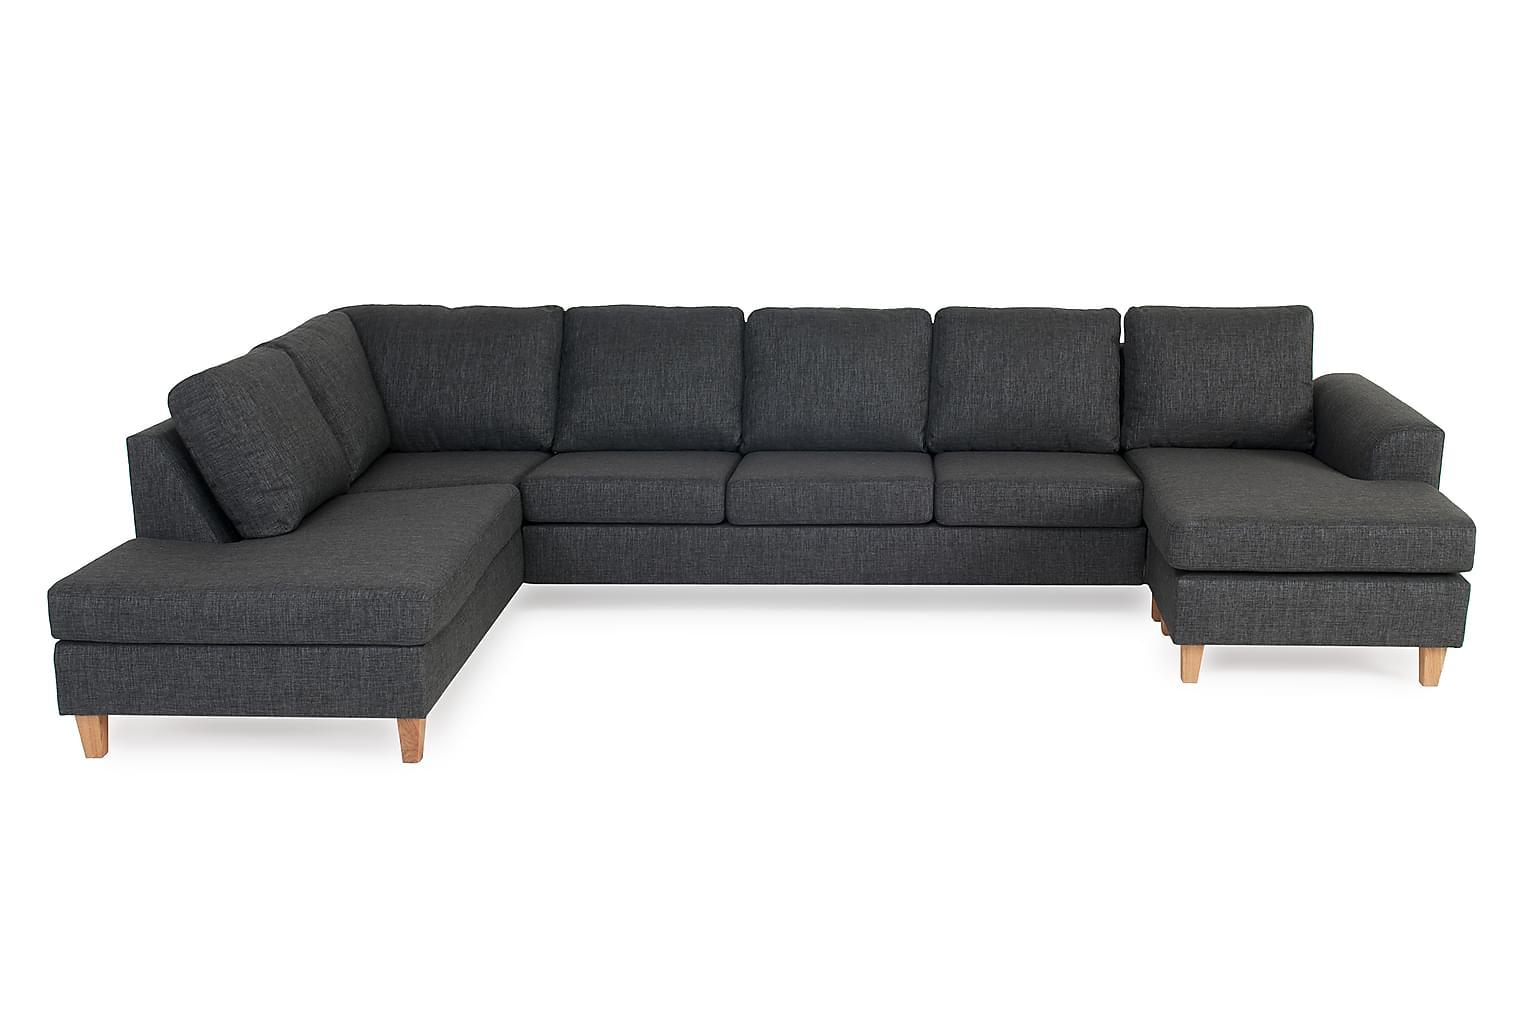 Torin TORIN U-soffa XL Vänster Antracite/Ekben -